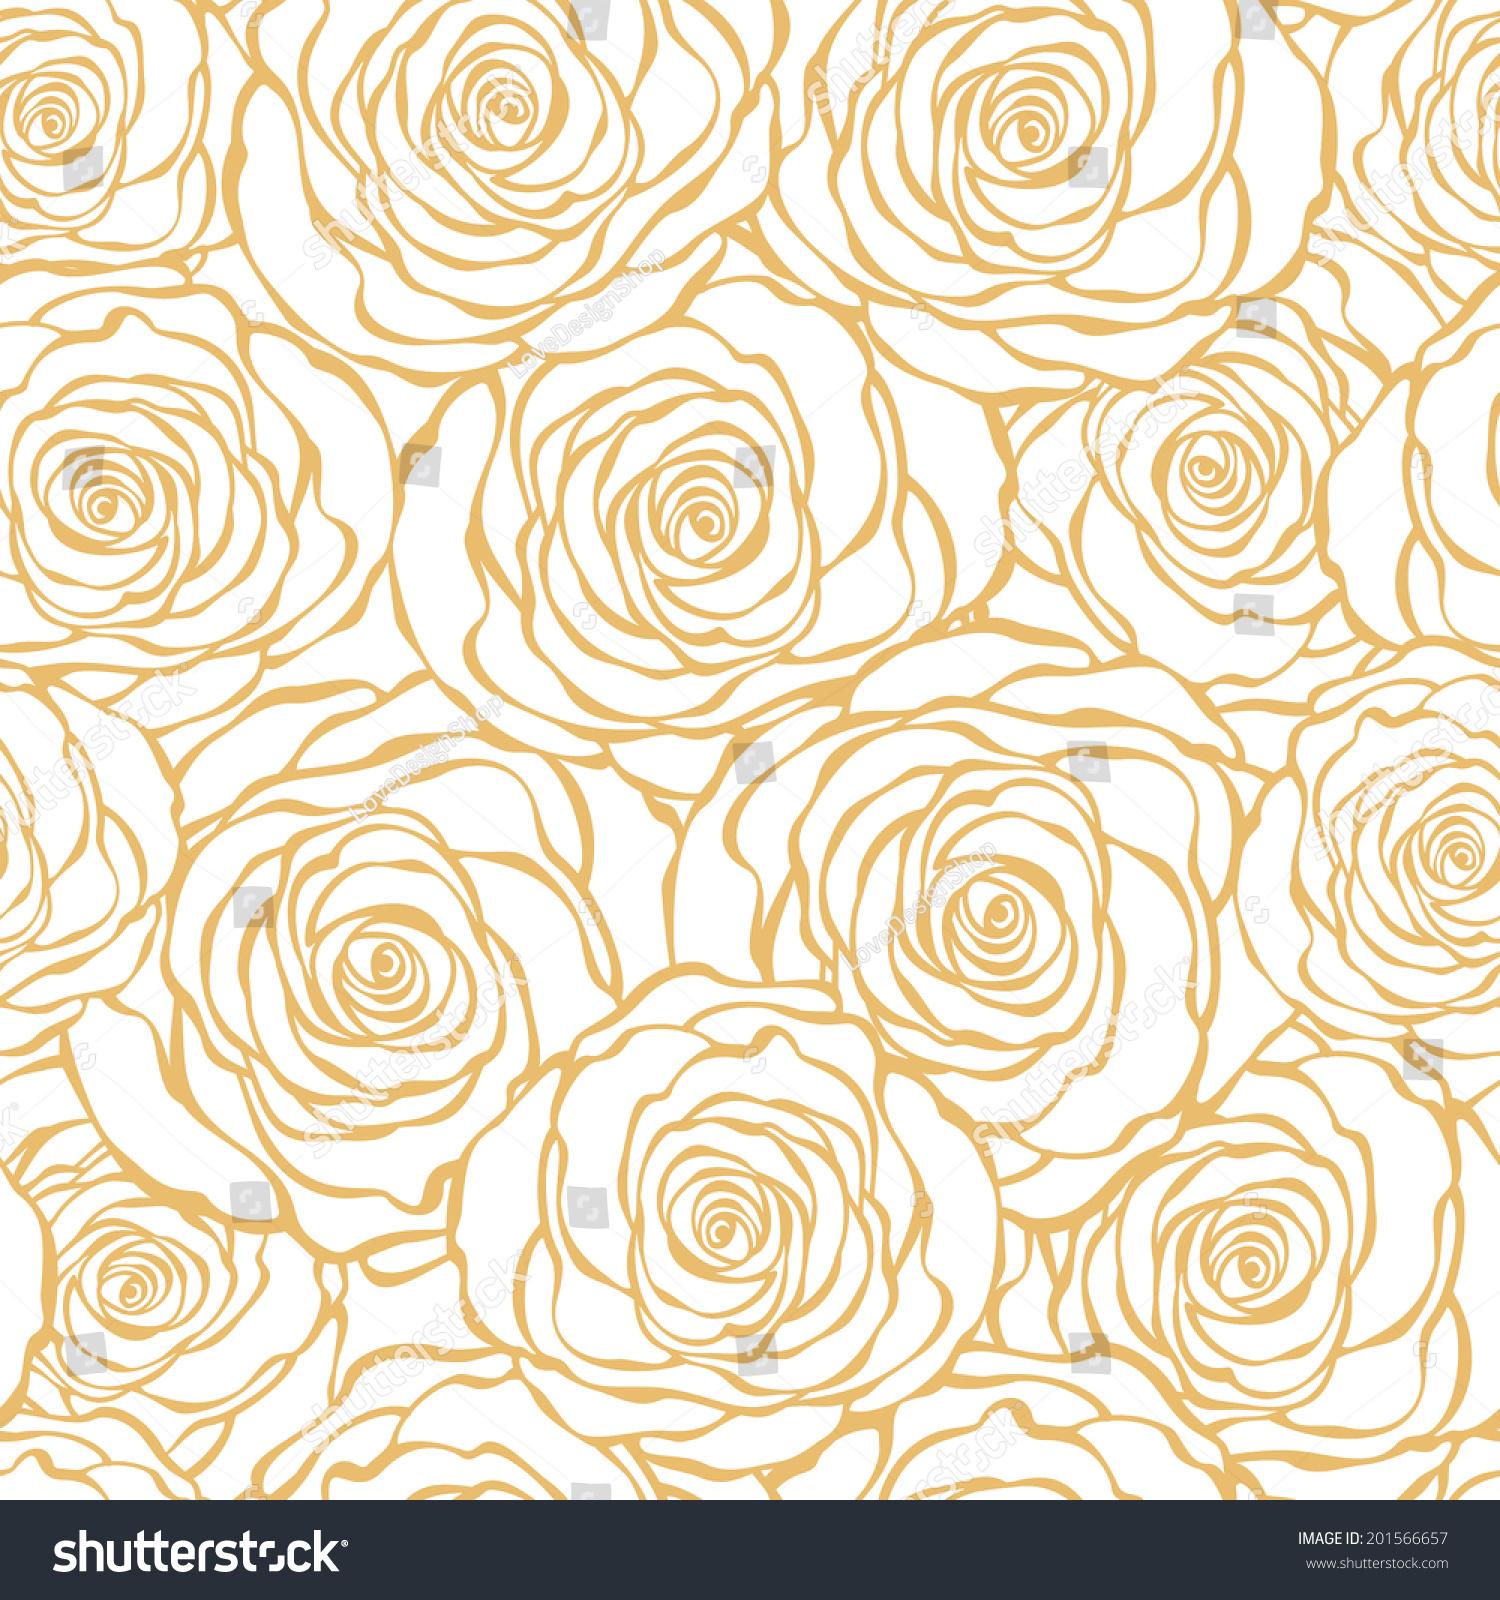 Happy Birthday 3d Live Wallpaper Download Art Deco Floral Wallpaper Gallery